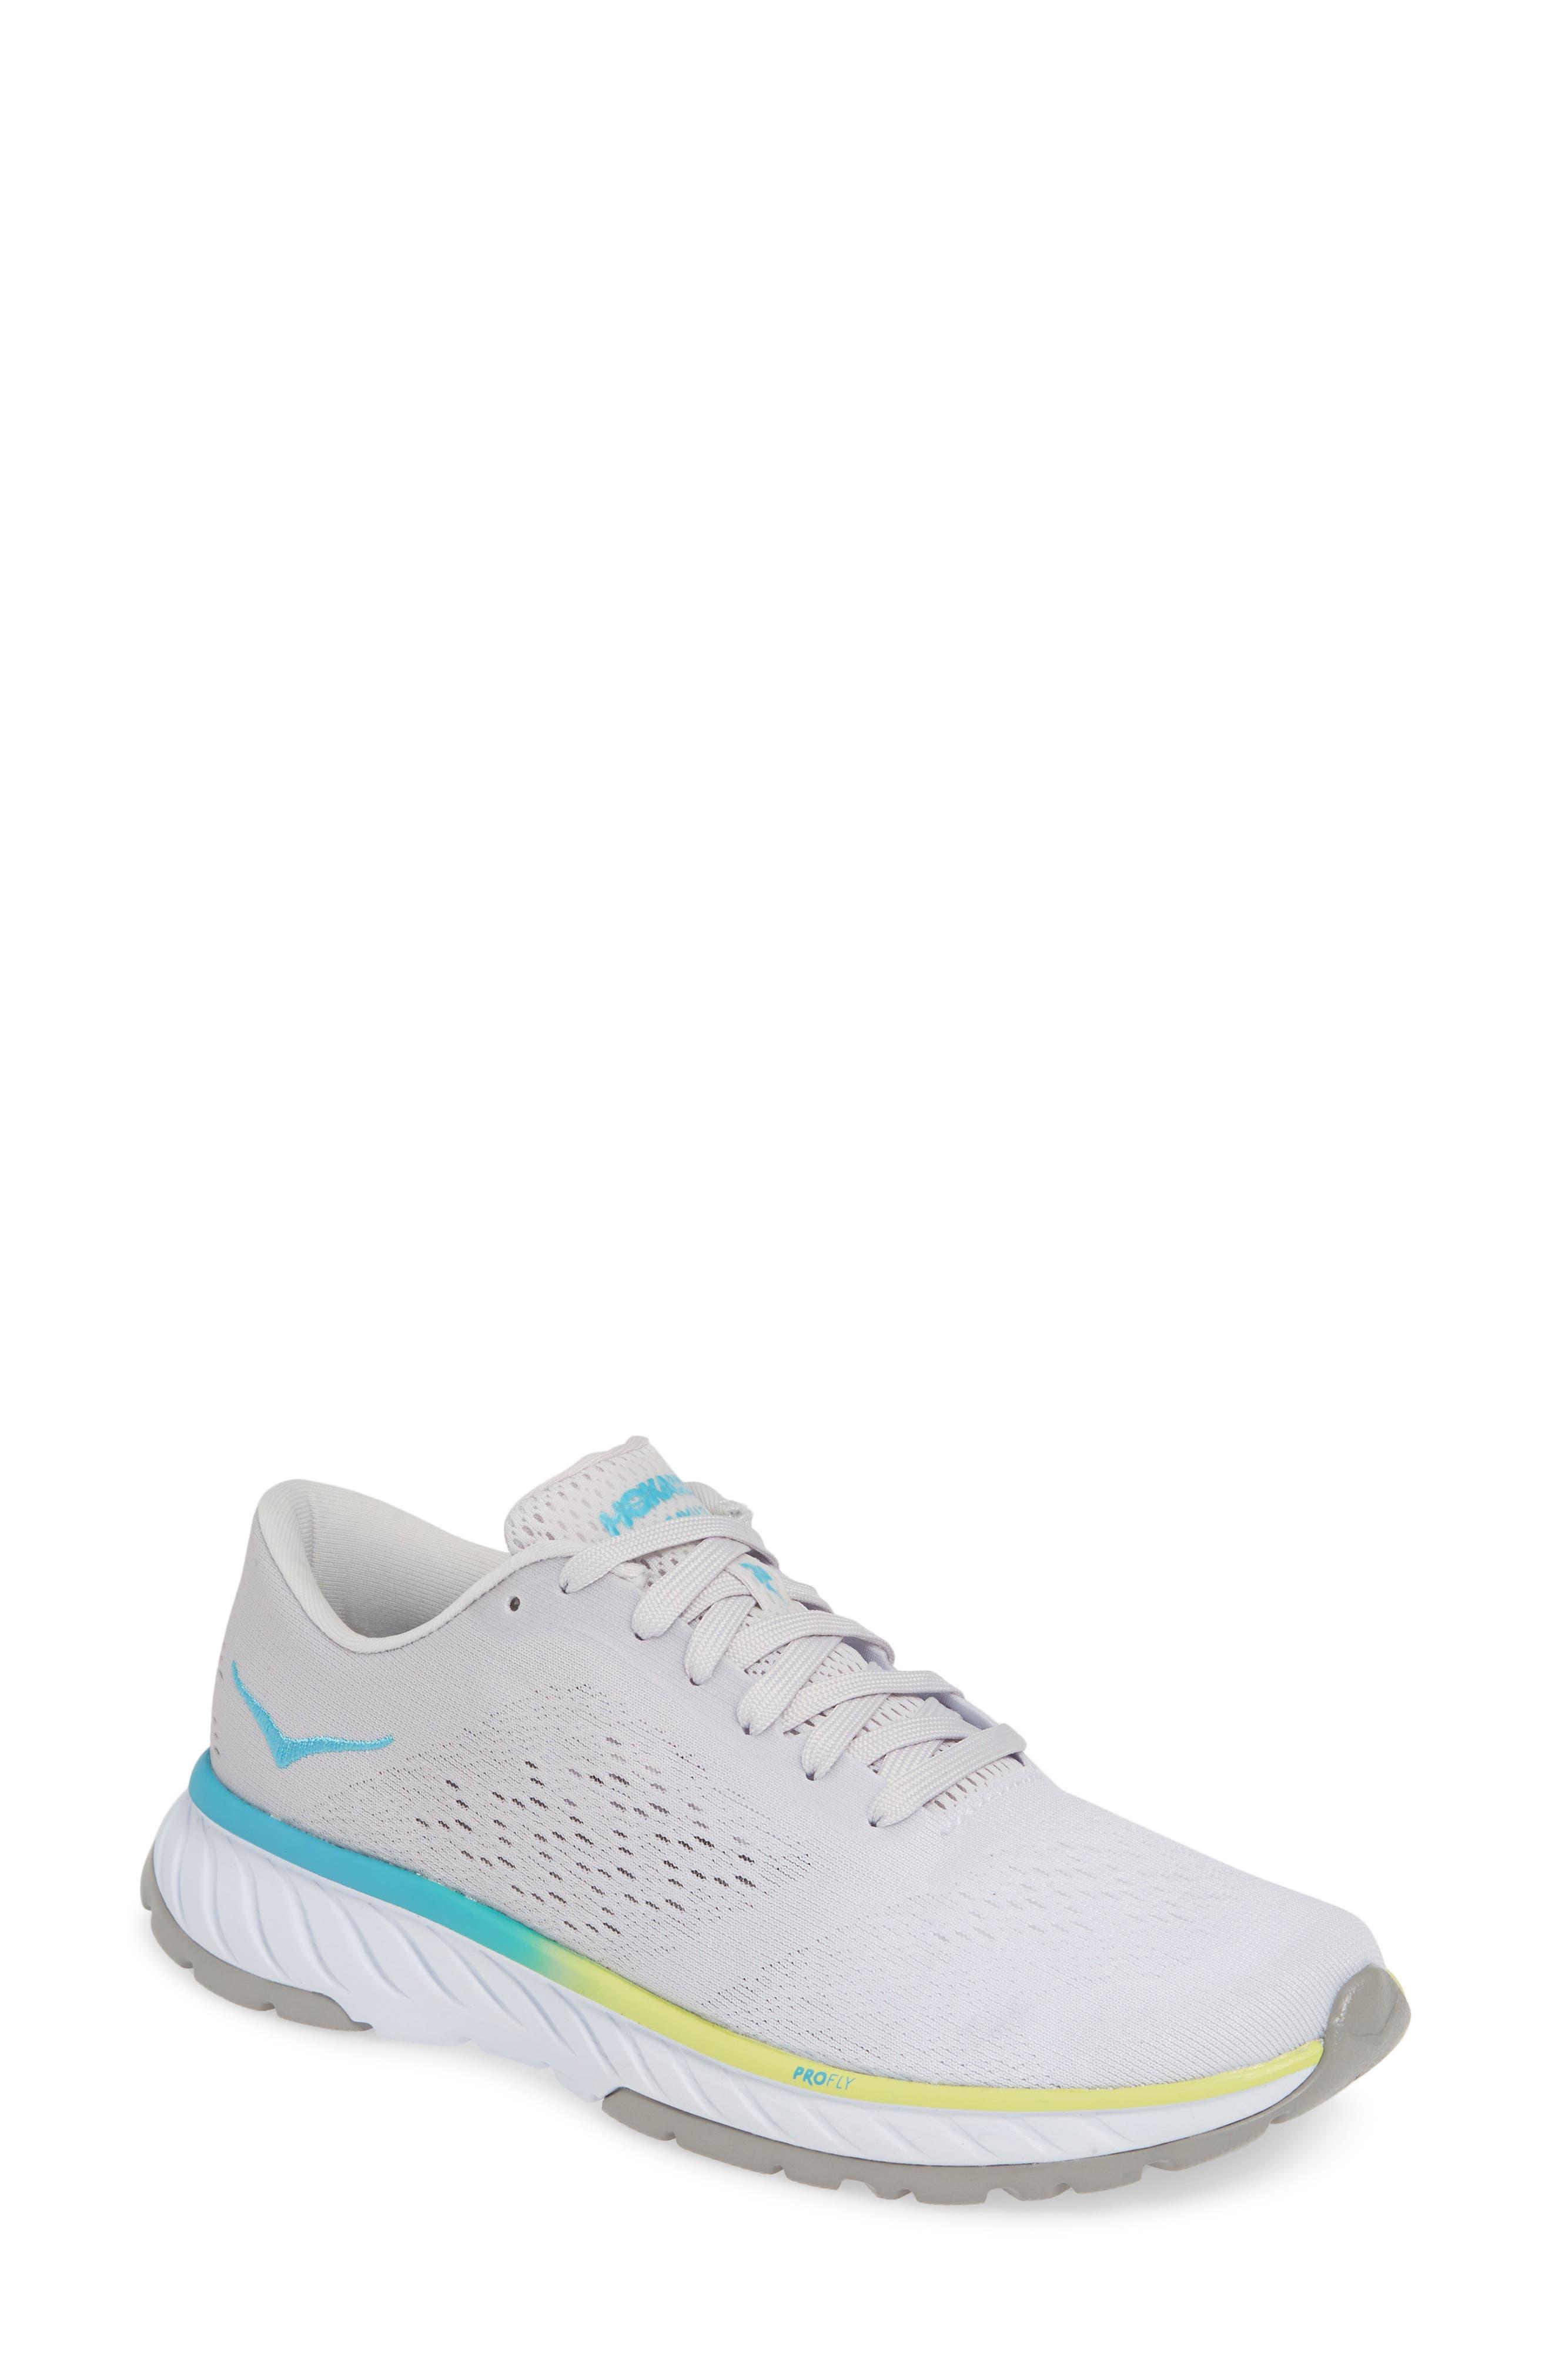 Hoka One One Cavu 2 Running Shoe, Grey